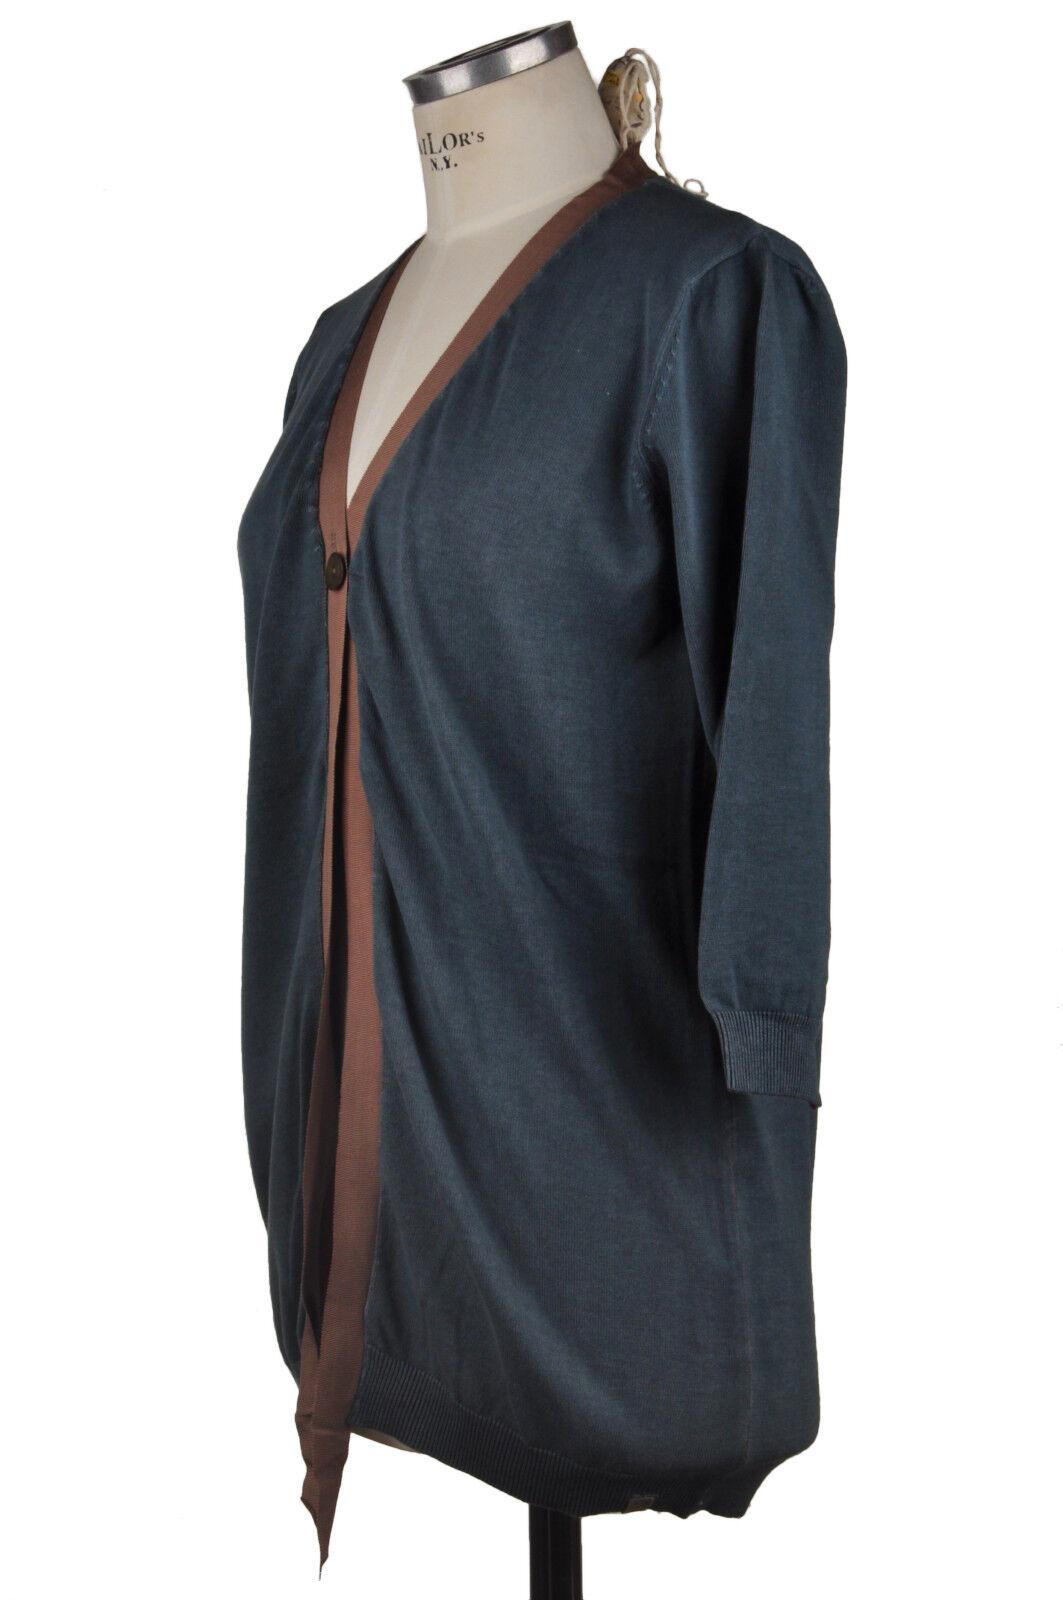 Szen - Knitwear-Cardigan - woman - braun - 683517C185416